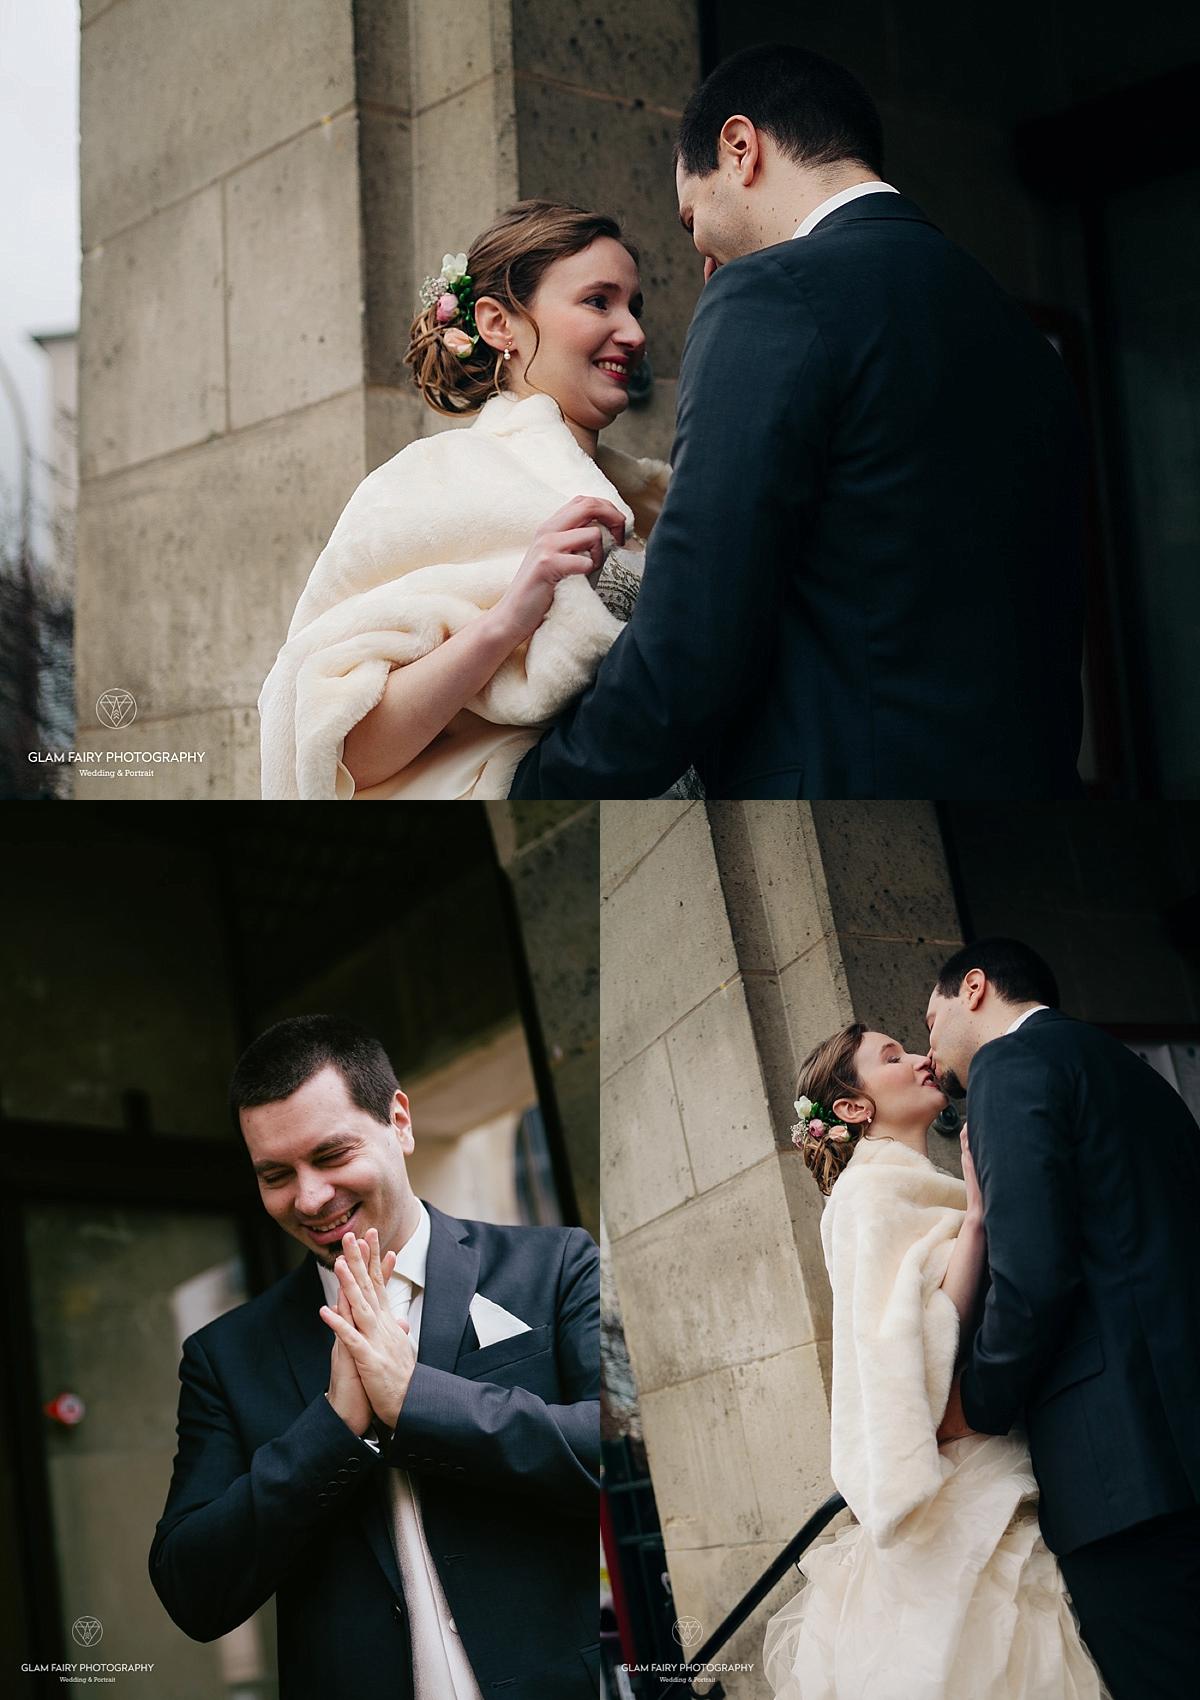 GlamFairyPhotography-mariage-hiver-pressigny-les-pins-aryz_0011